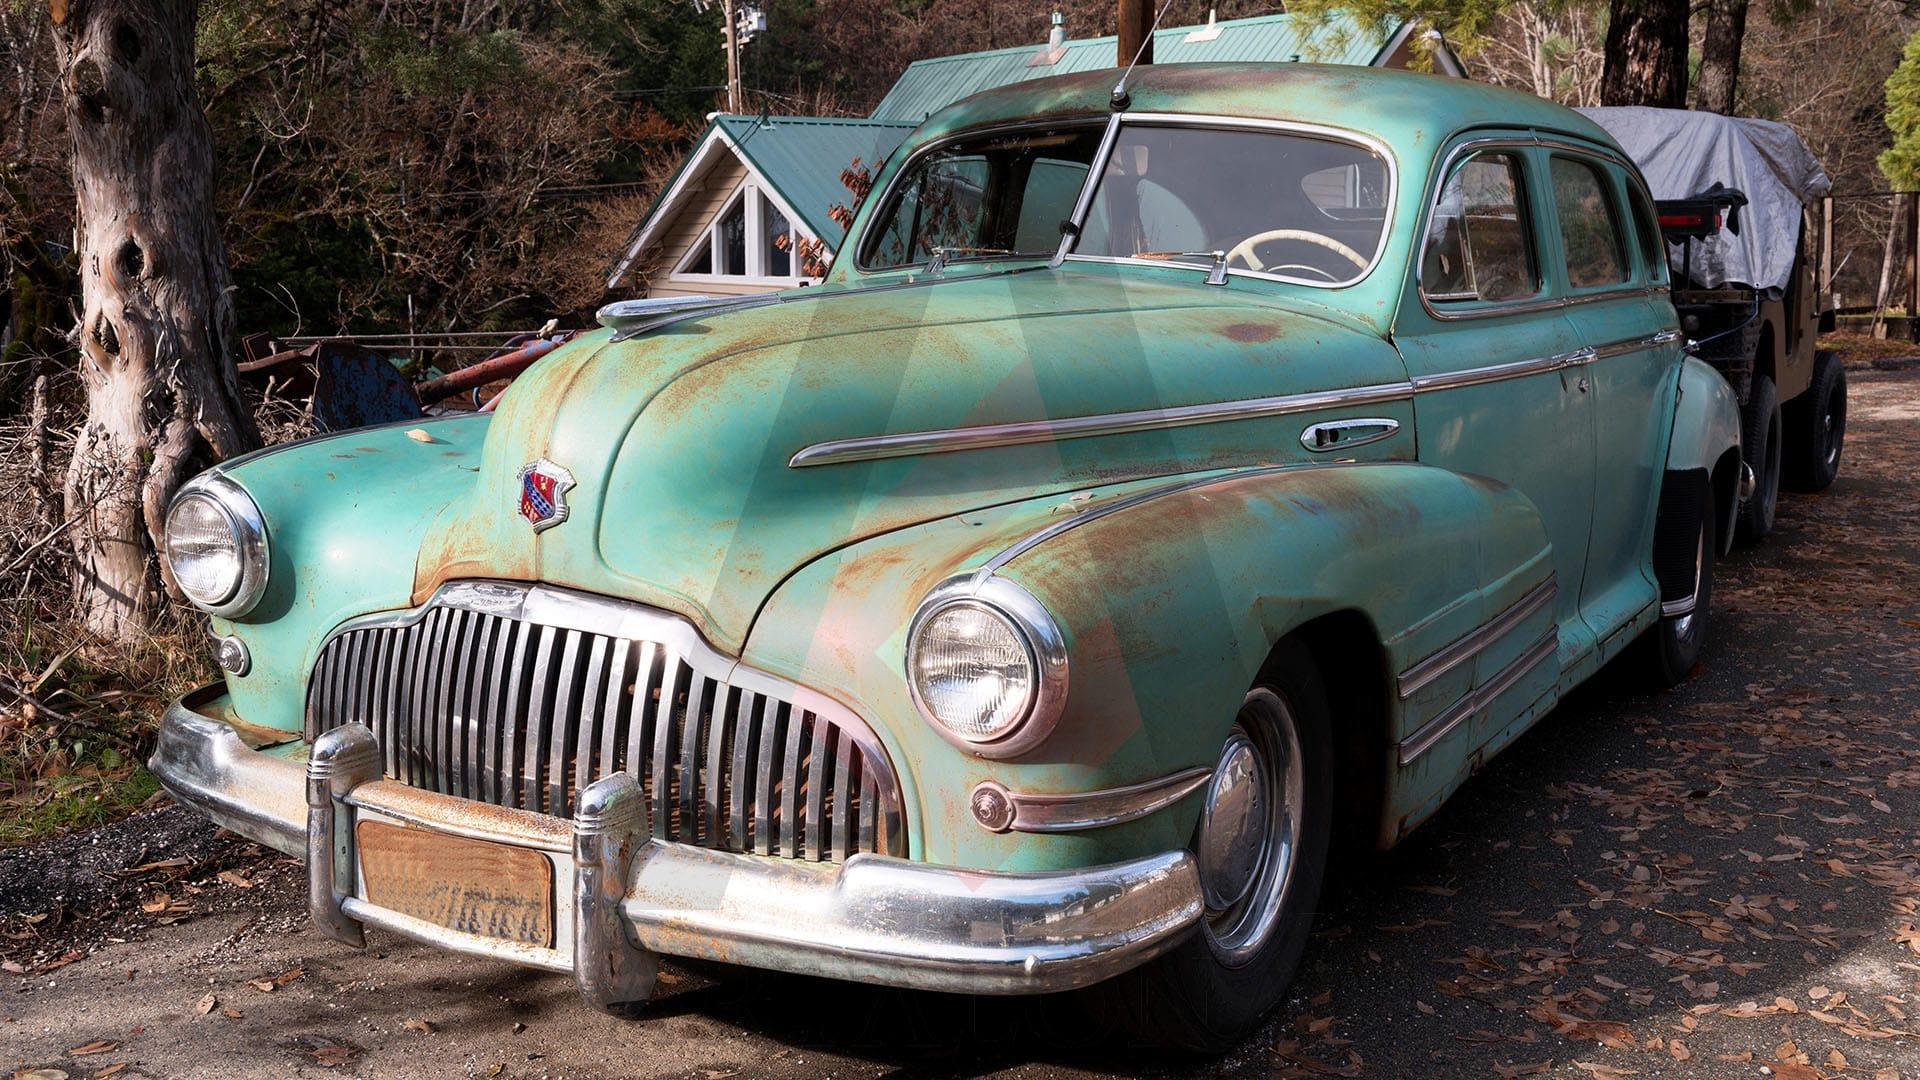 Before-Automotive Image Restoration